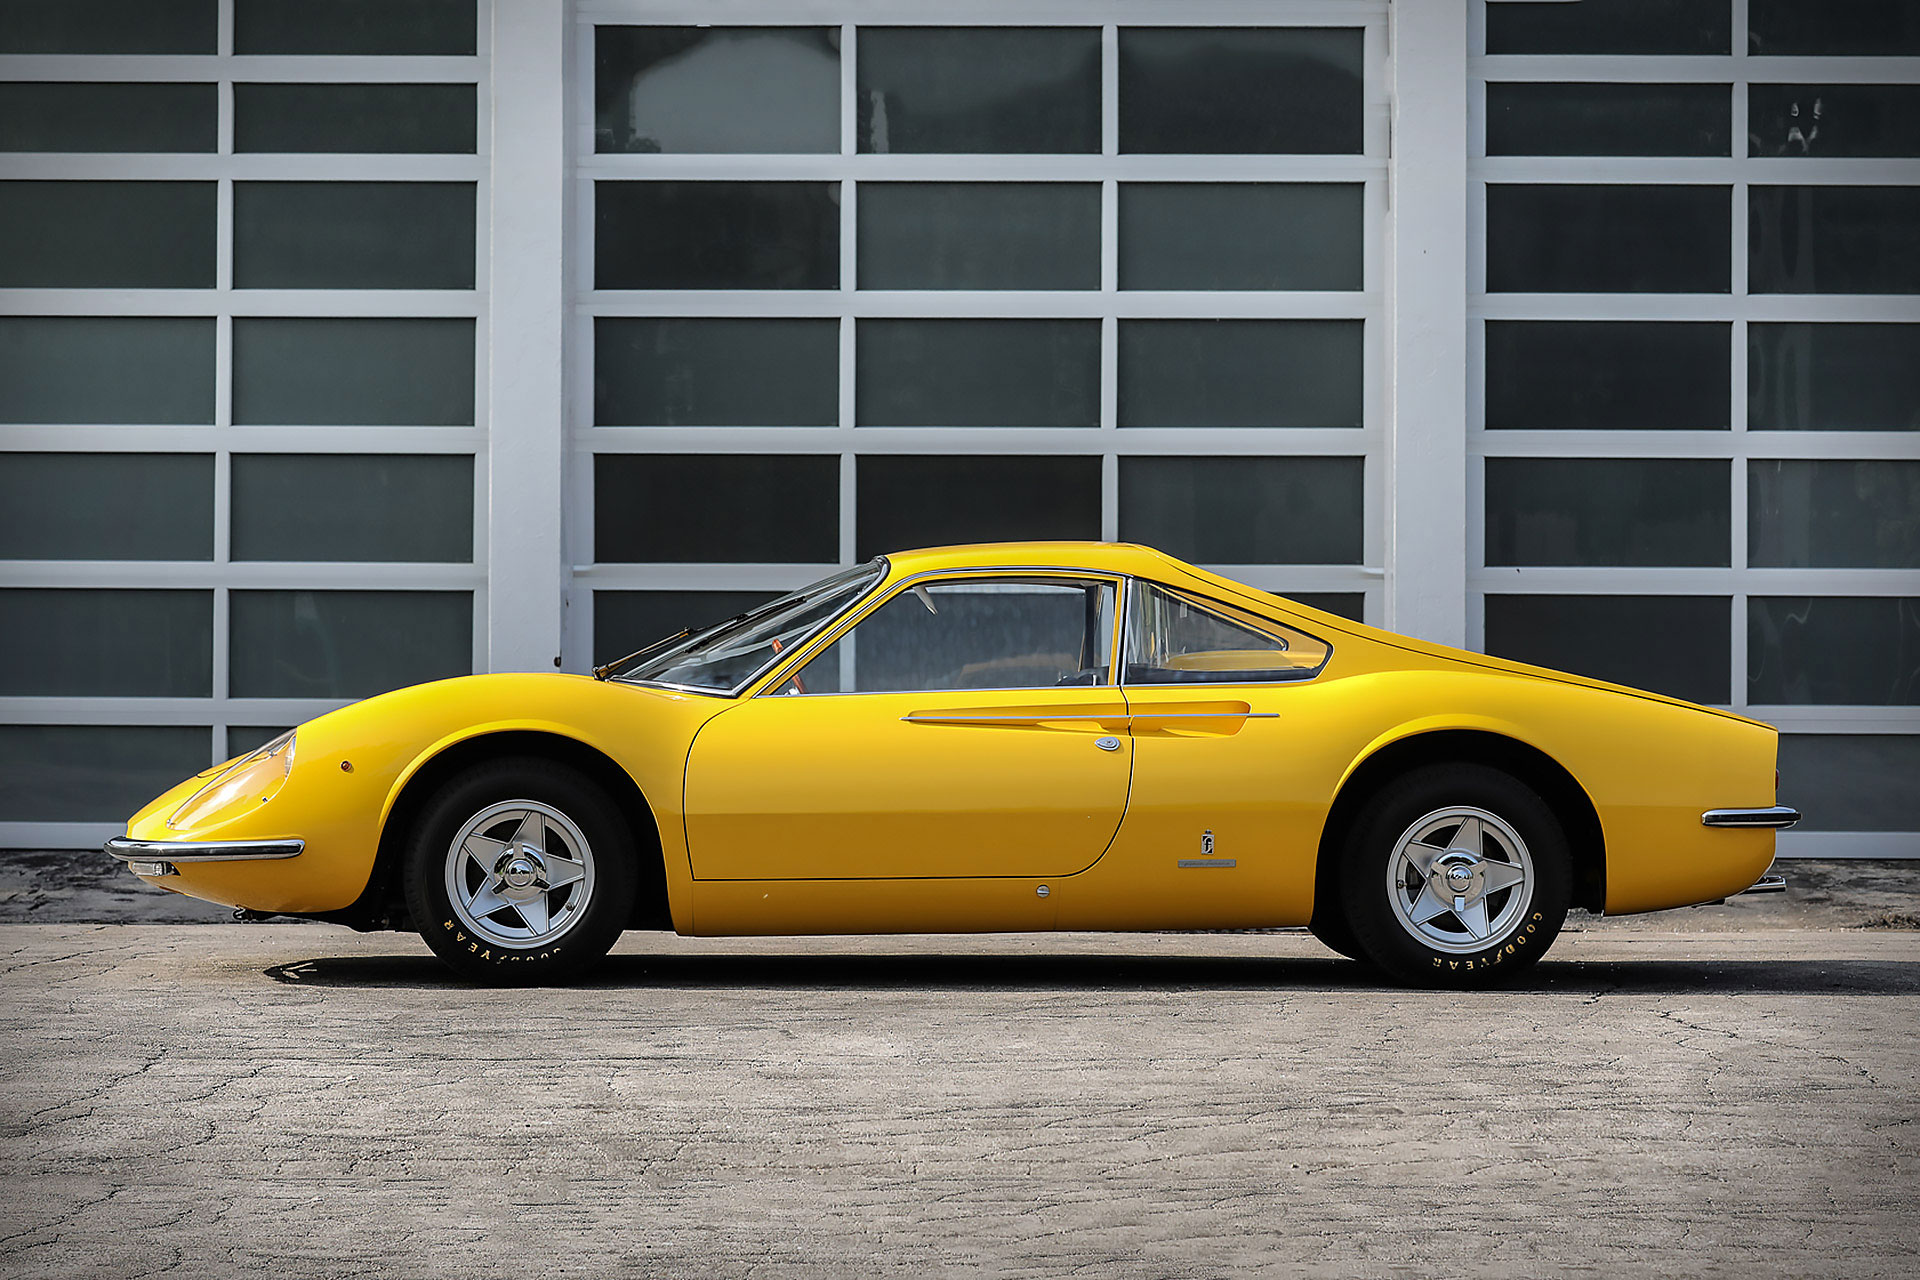 1966 Ferrari Dino Berlinetta GT Prototype